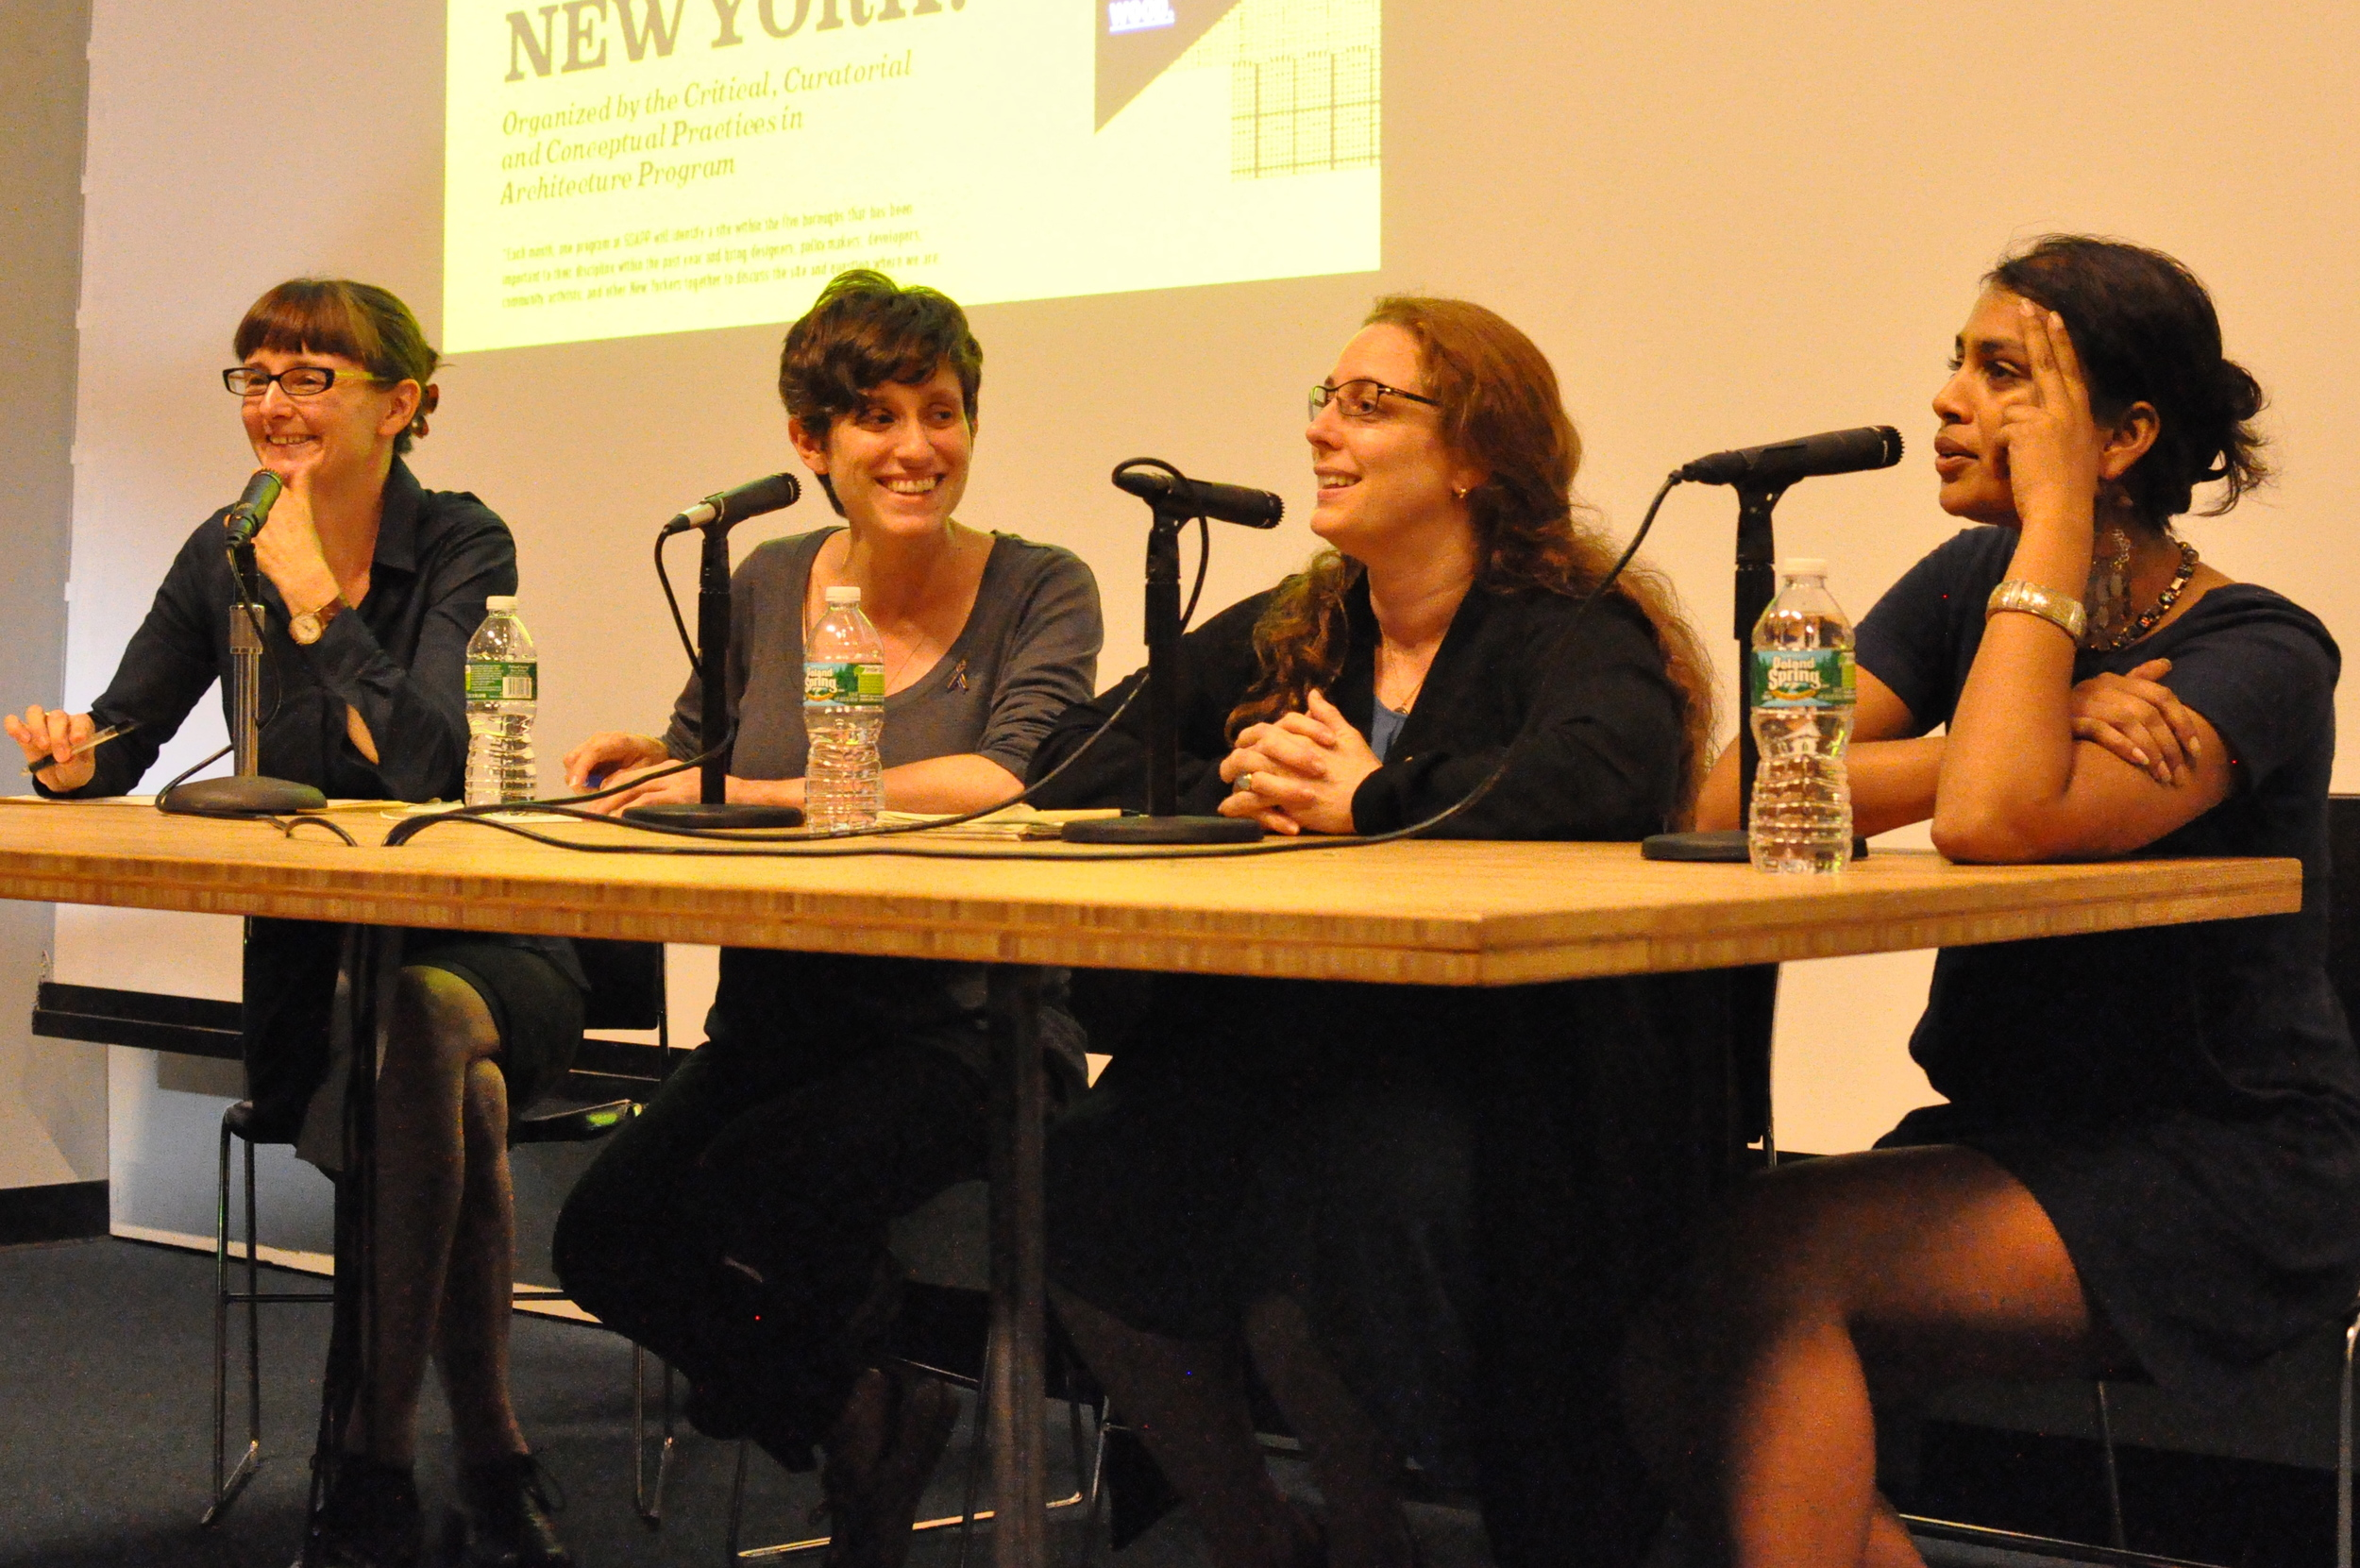 Felicity Scott, Larissa Harris, Tania Brugera, and Prerarna Reddy, September 26, 2011, Wood Auditorium, Columbia University.